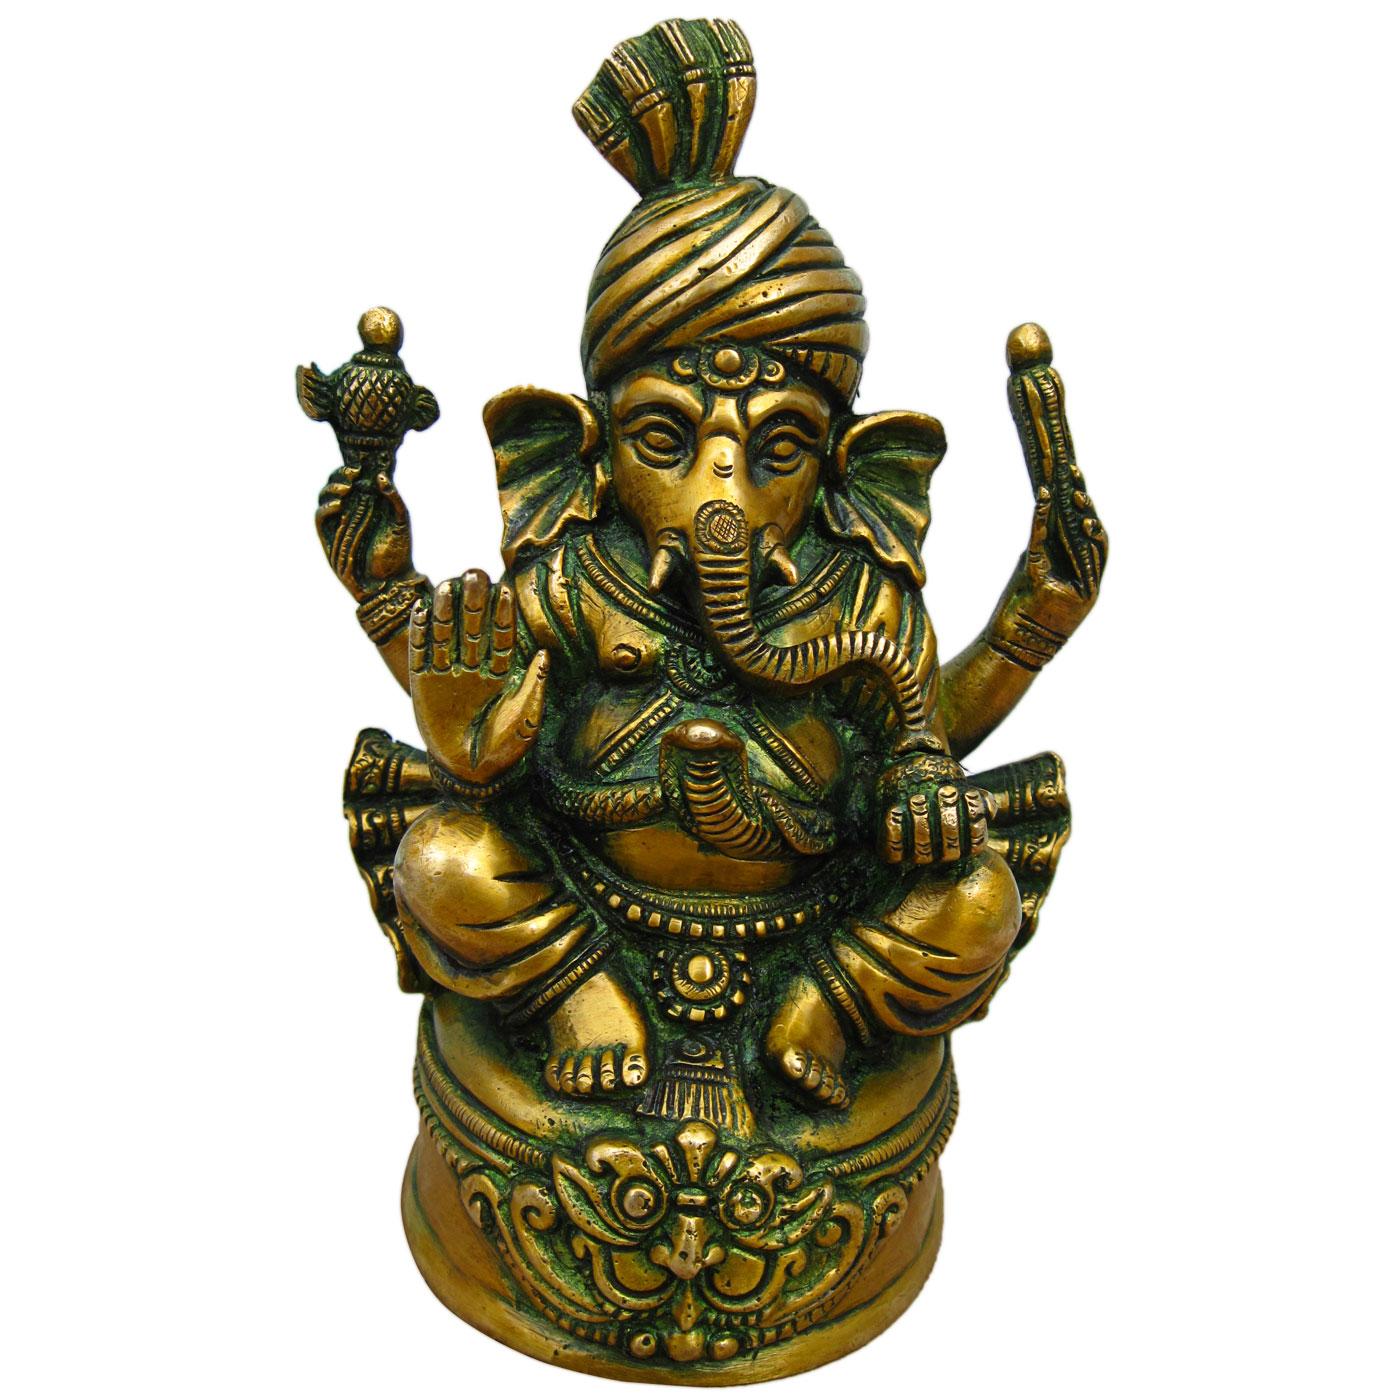 http://3.bp.blogspot.com/-wW8JwYJuLIw/T43siCCnbCI/AAAAAAAADEI/Lny2dQSJ0cY/s1600/ganesh-statue.jpg